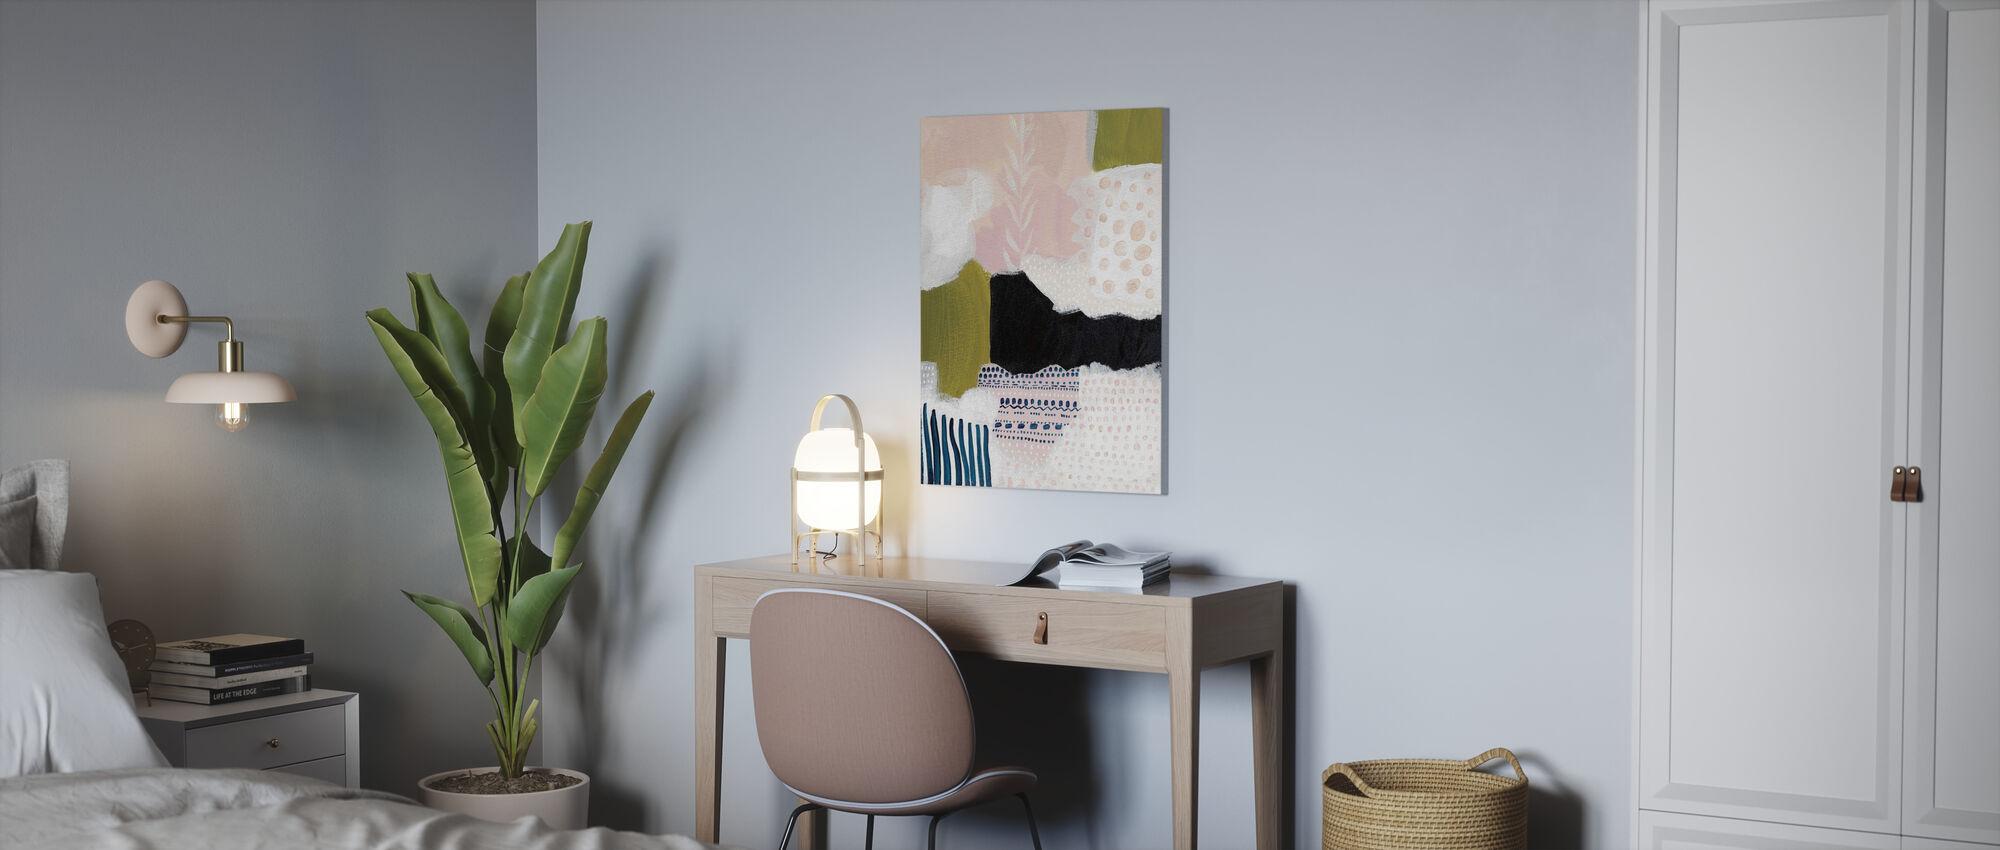 Tribal Study - Canvas print - Office